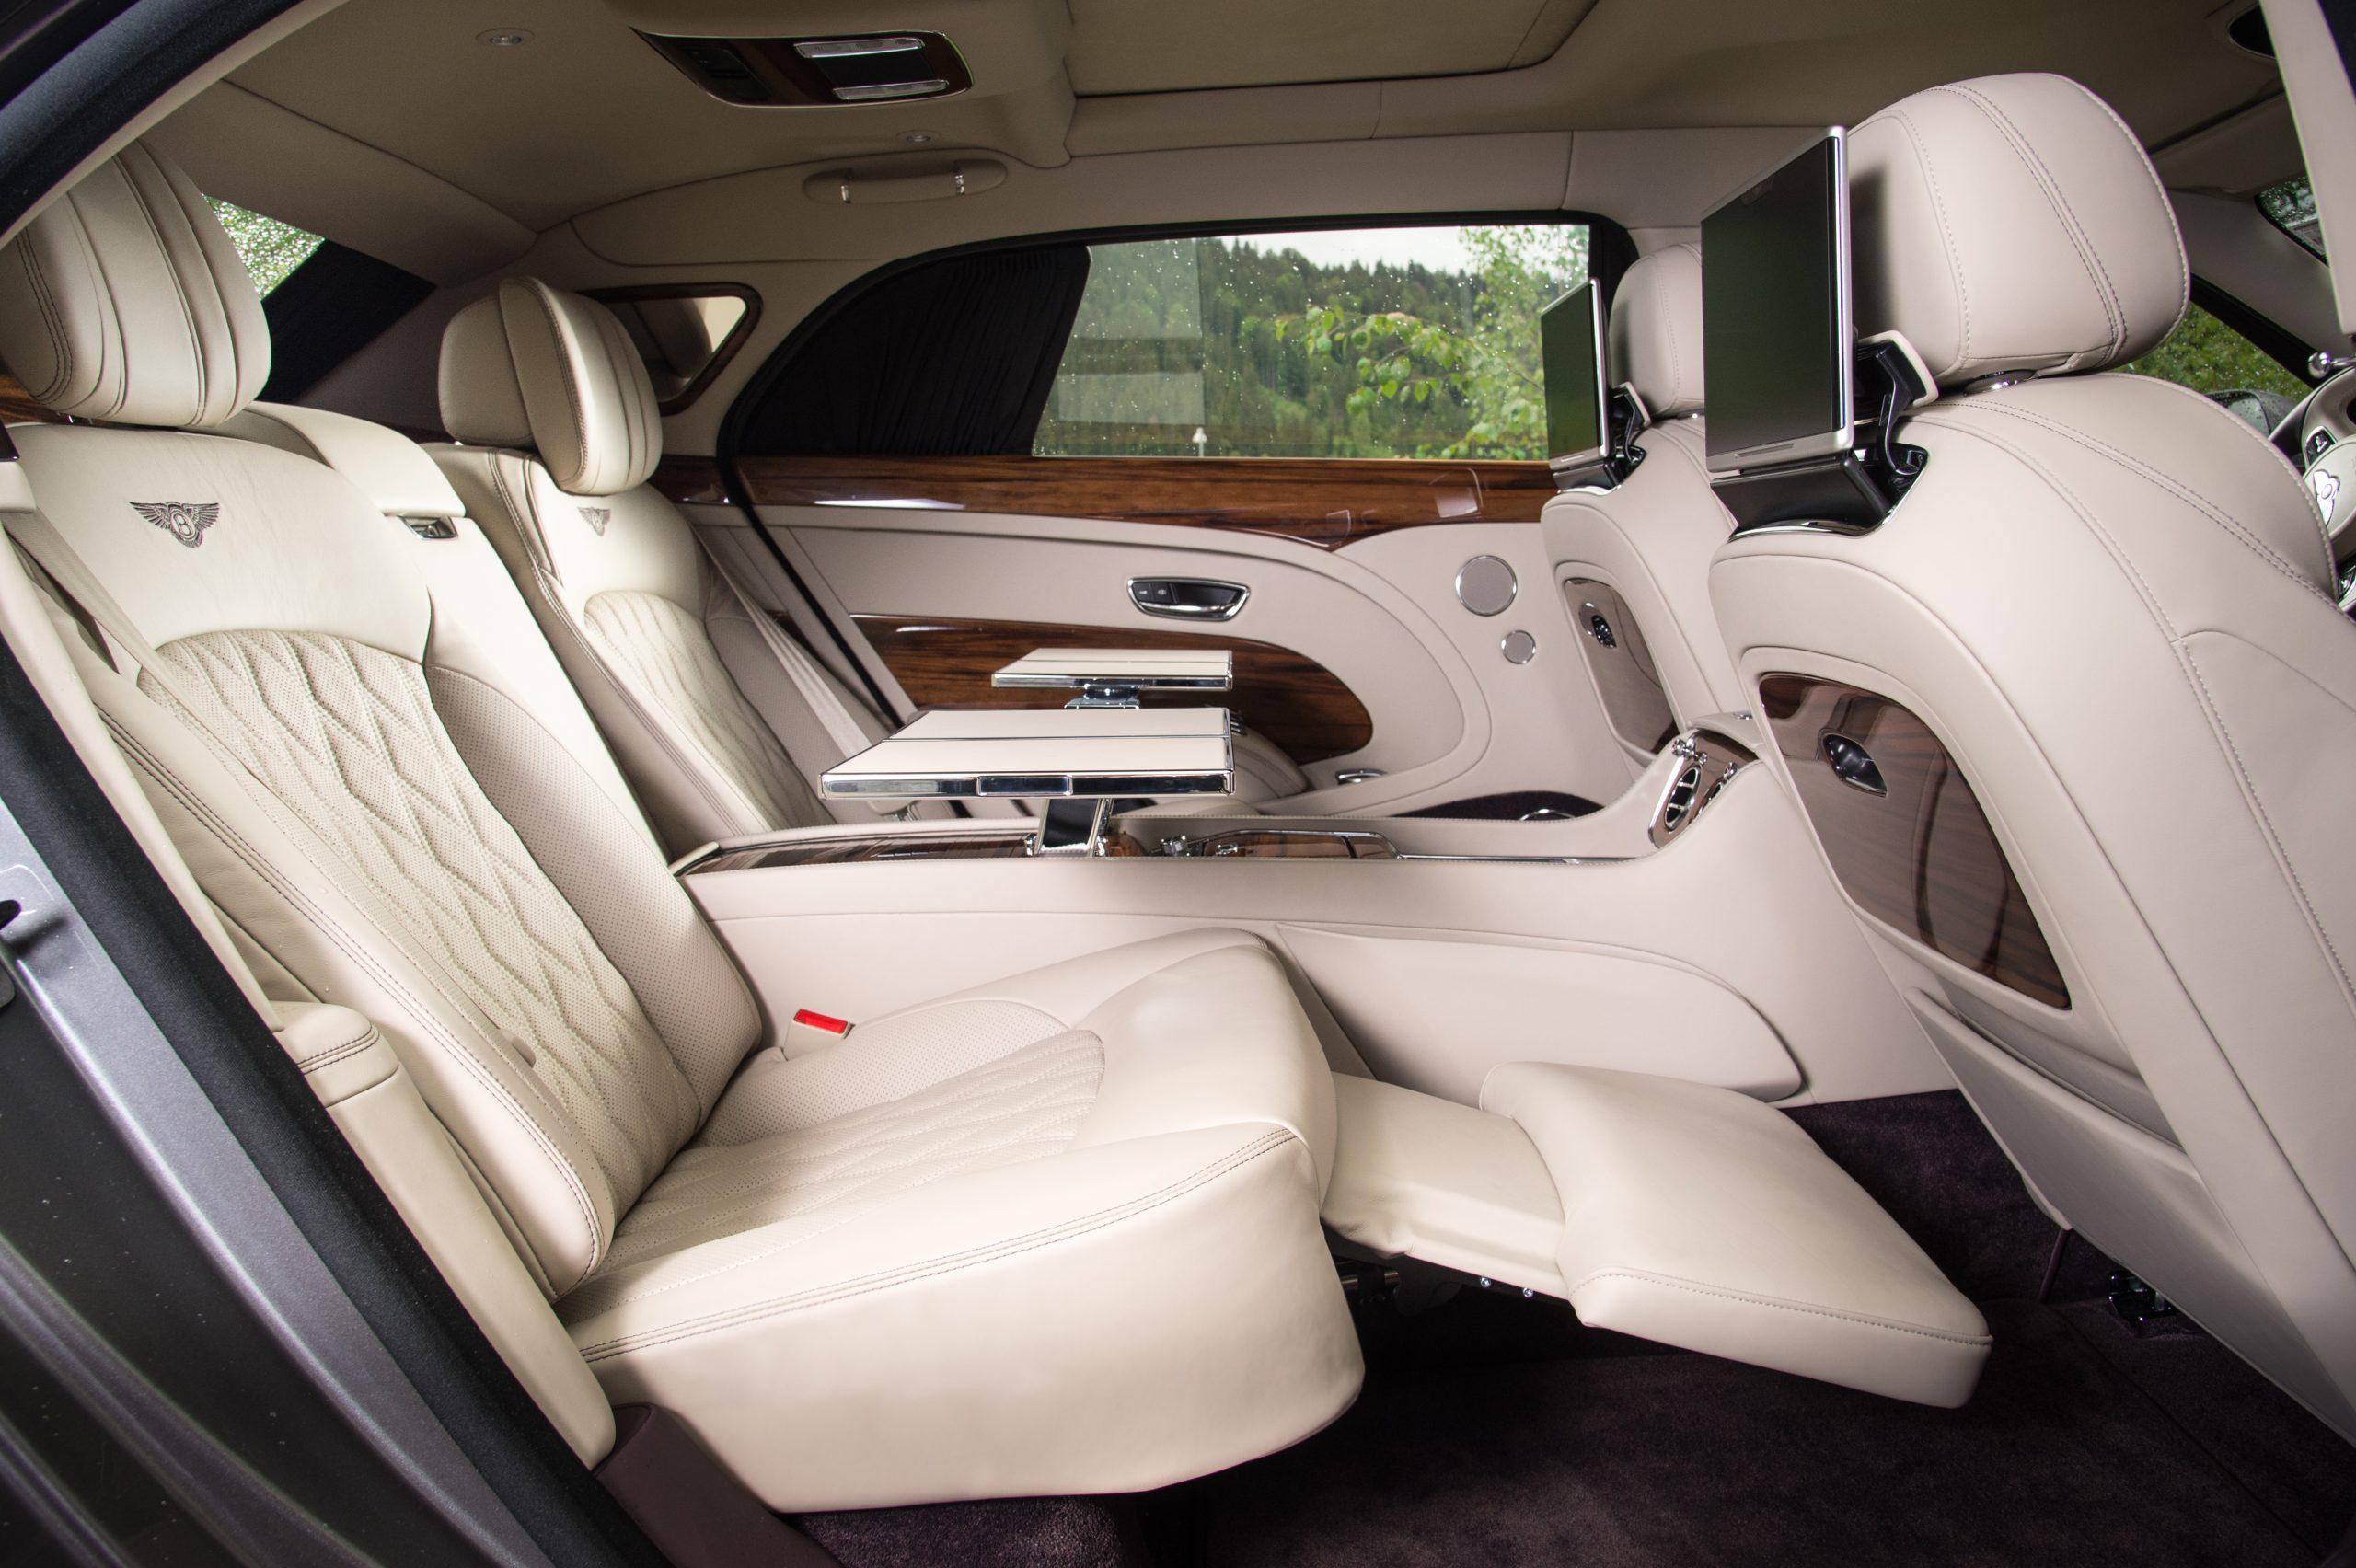 Bentley Mulsanne Extended Wheelbase interior